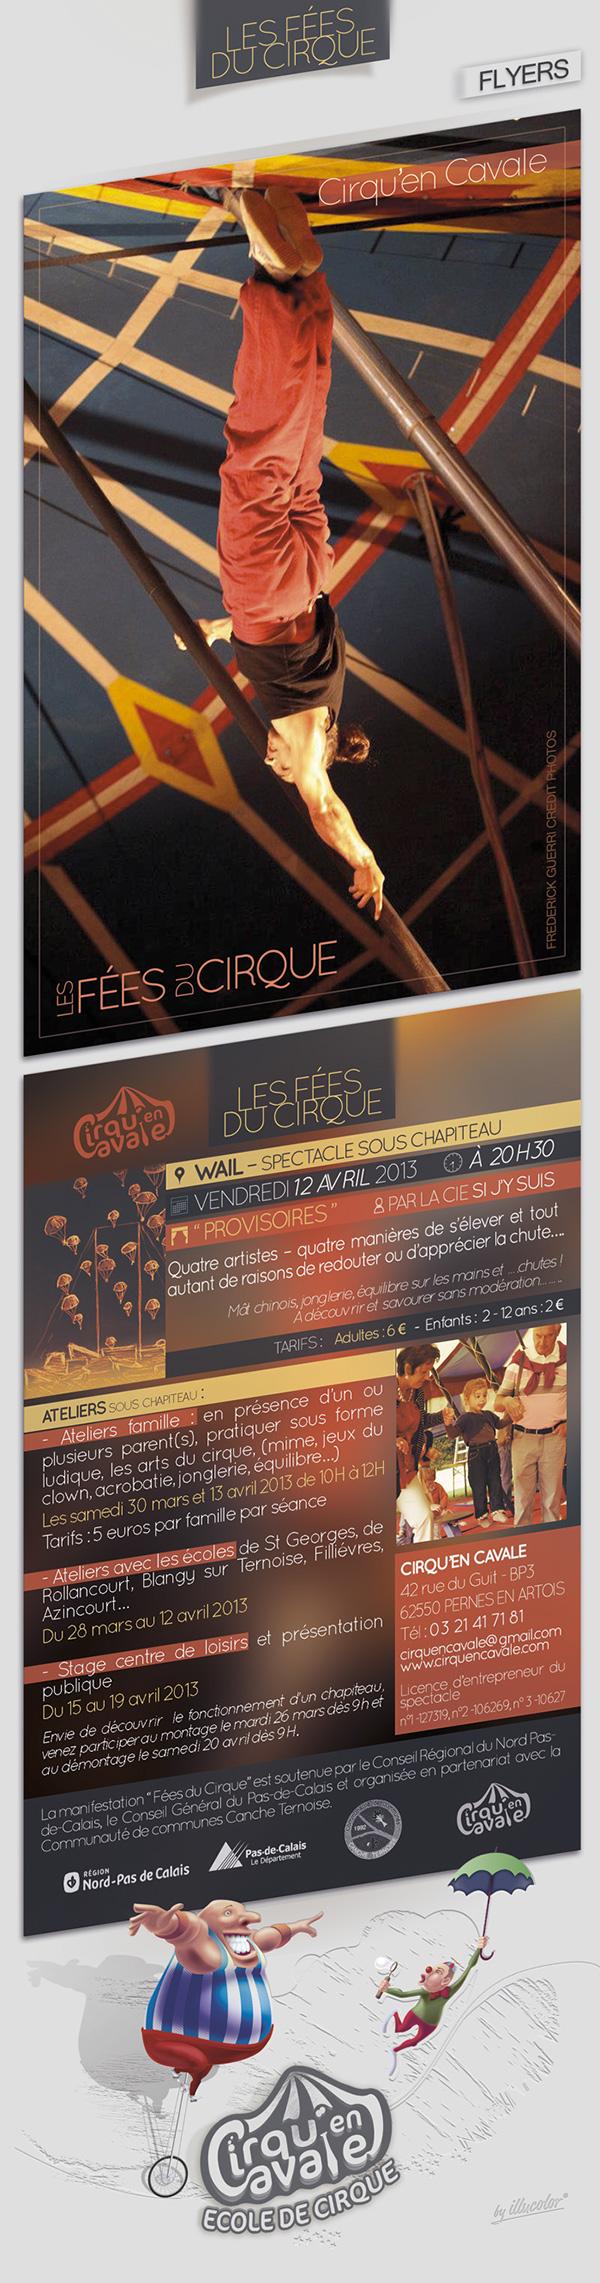 Circus print flyers fees Sectacle Entertainment Performance cirque impression marquee chapiteau cirqu'encavale